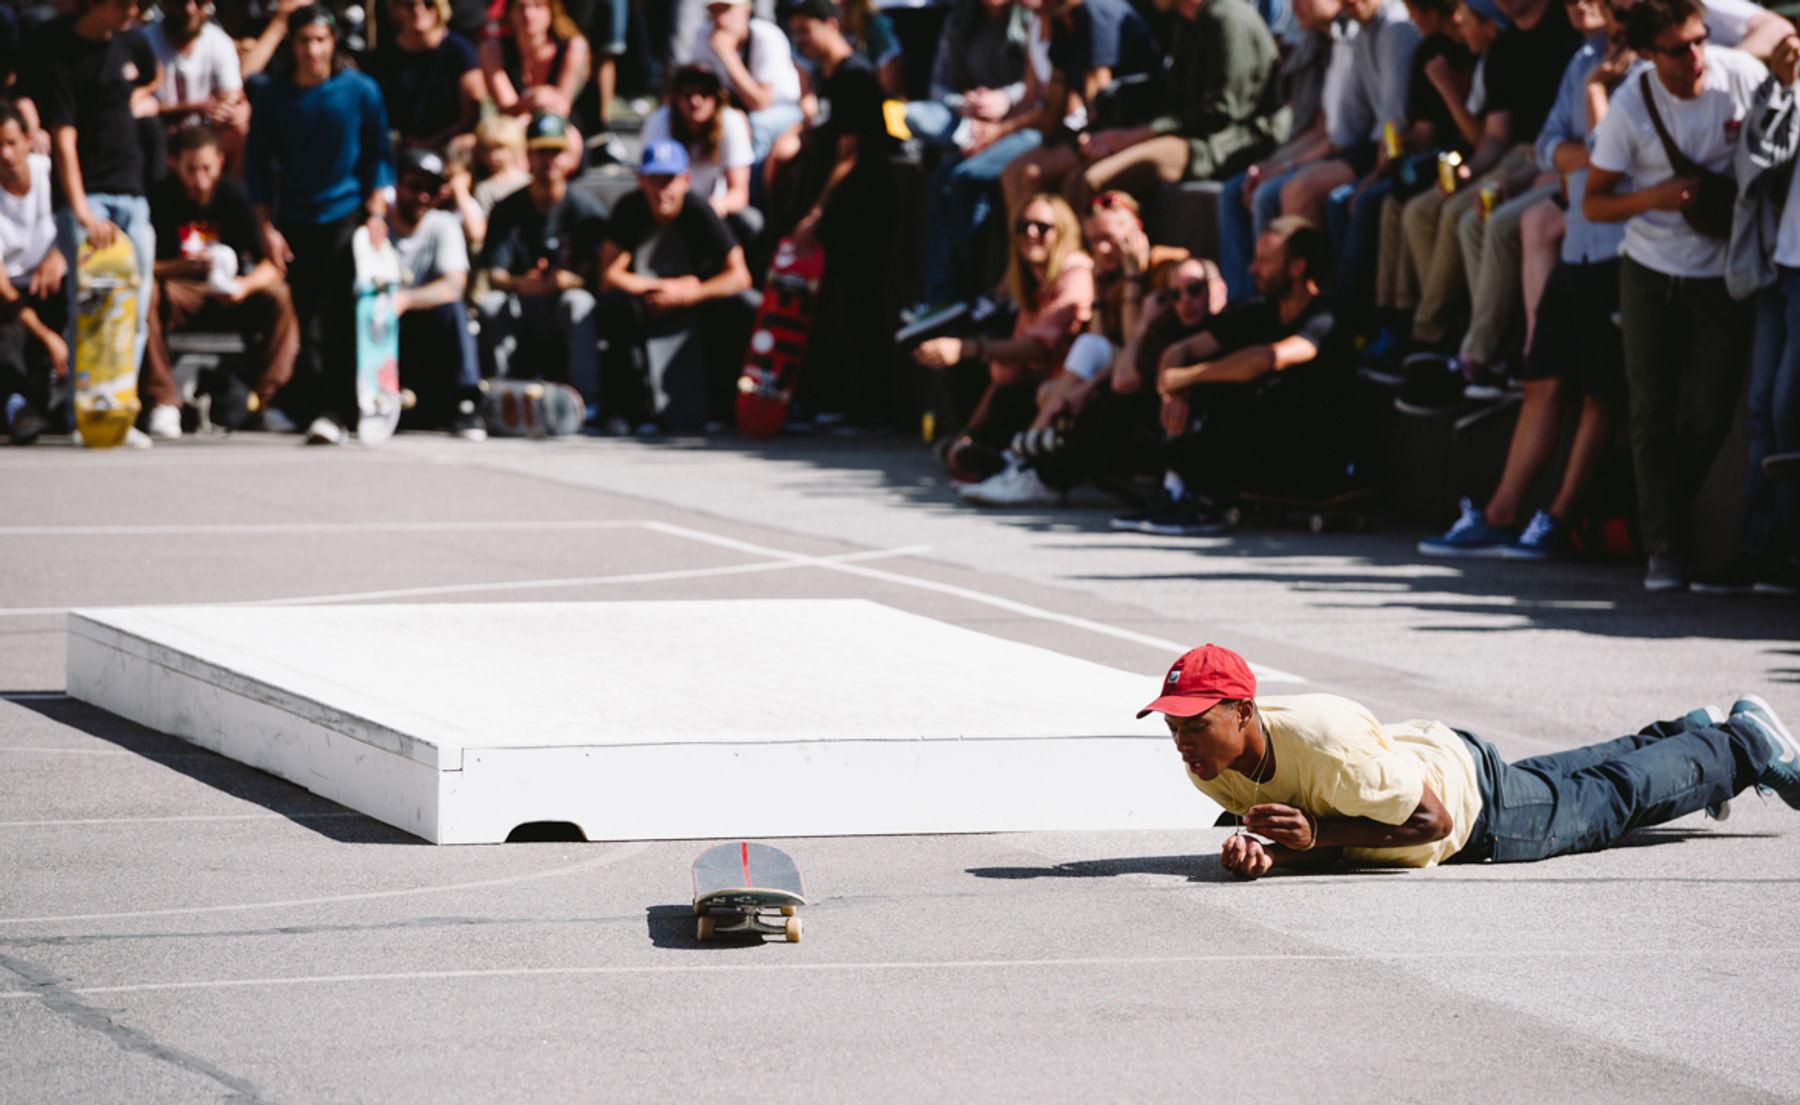 _IHC3828e-Ishod-Wair-Nike-SB-Copenhagen-Open-White-Banks-Nansensgade-Day-2-July-2015-Photographer-Maksim-Kalanep